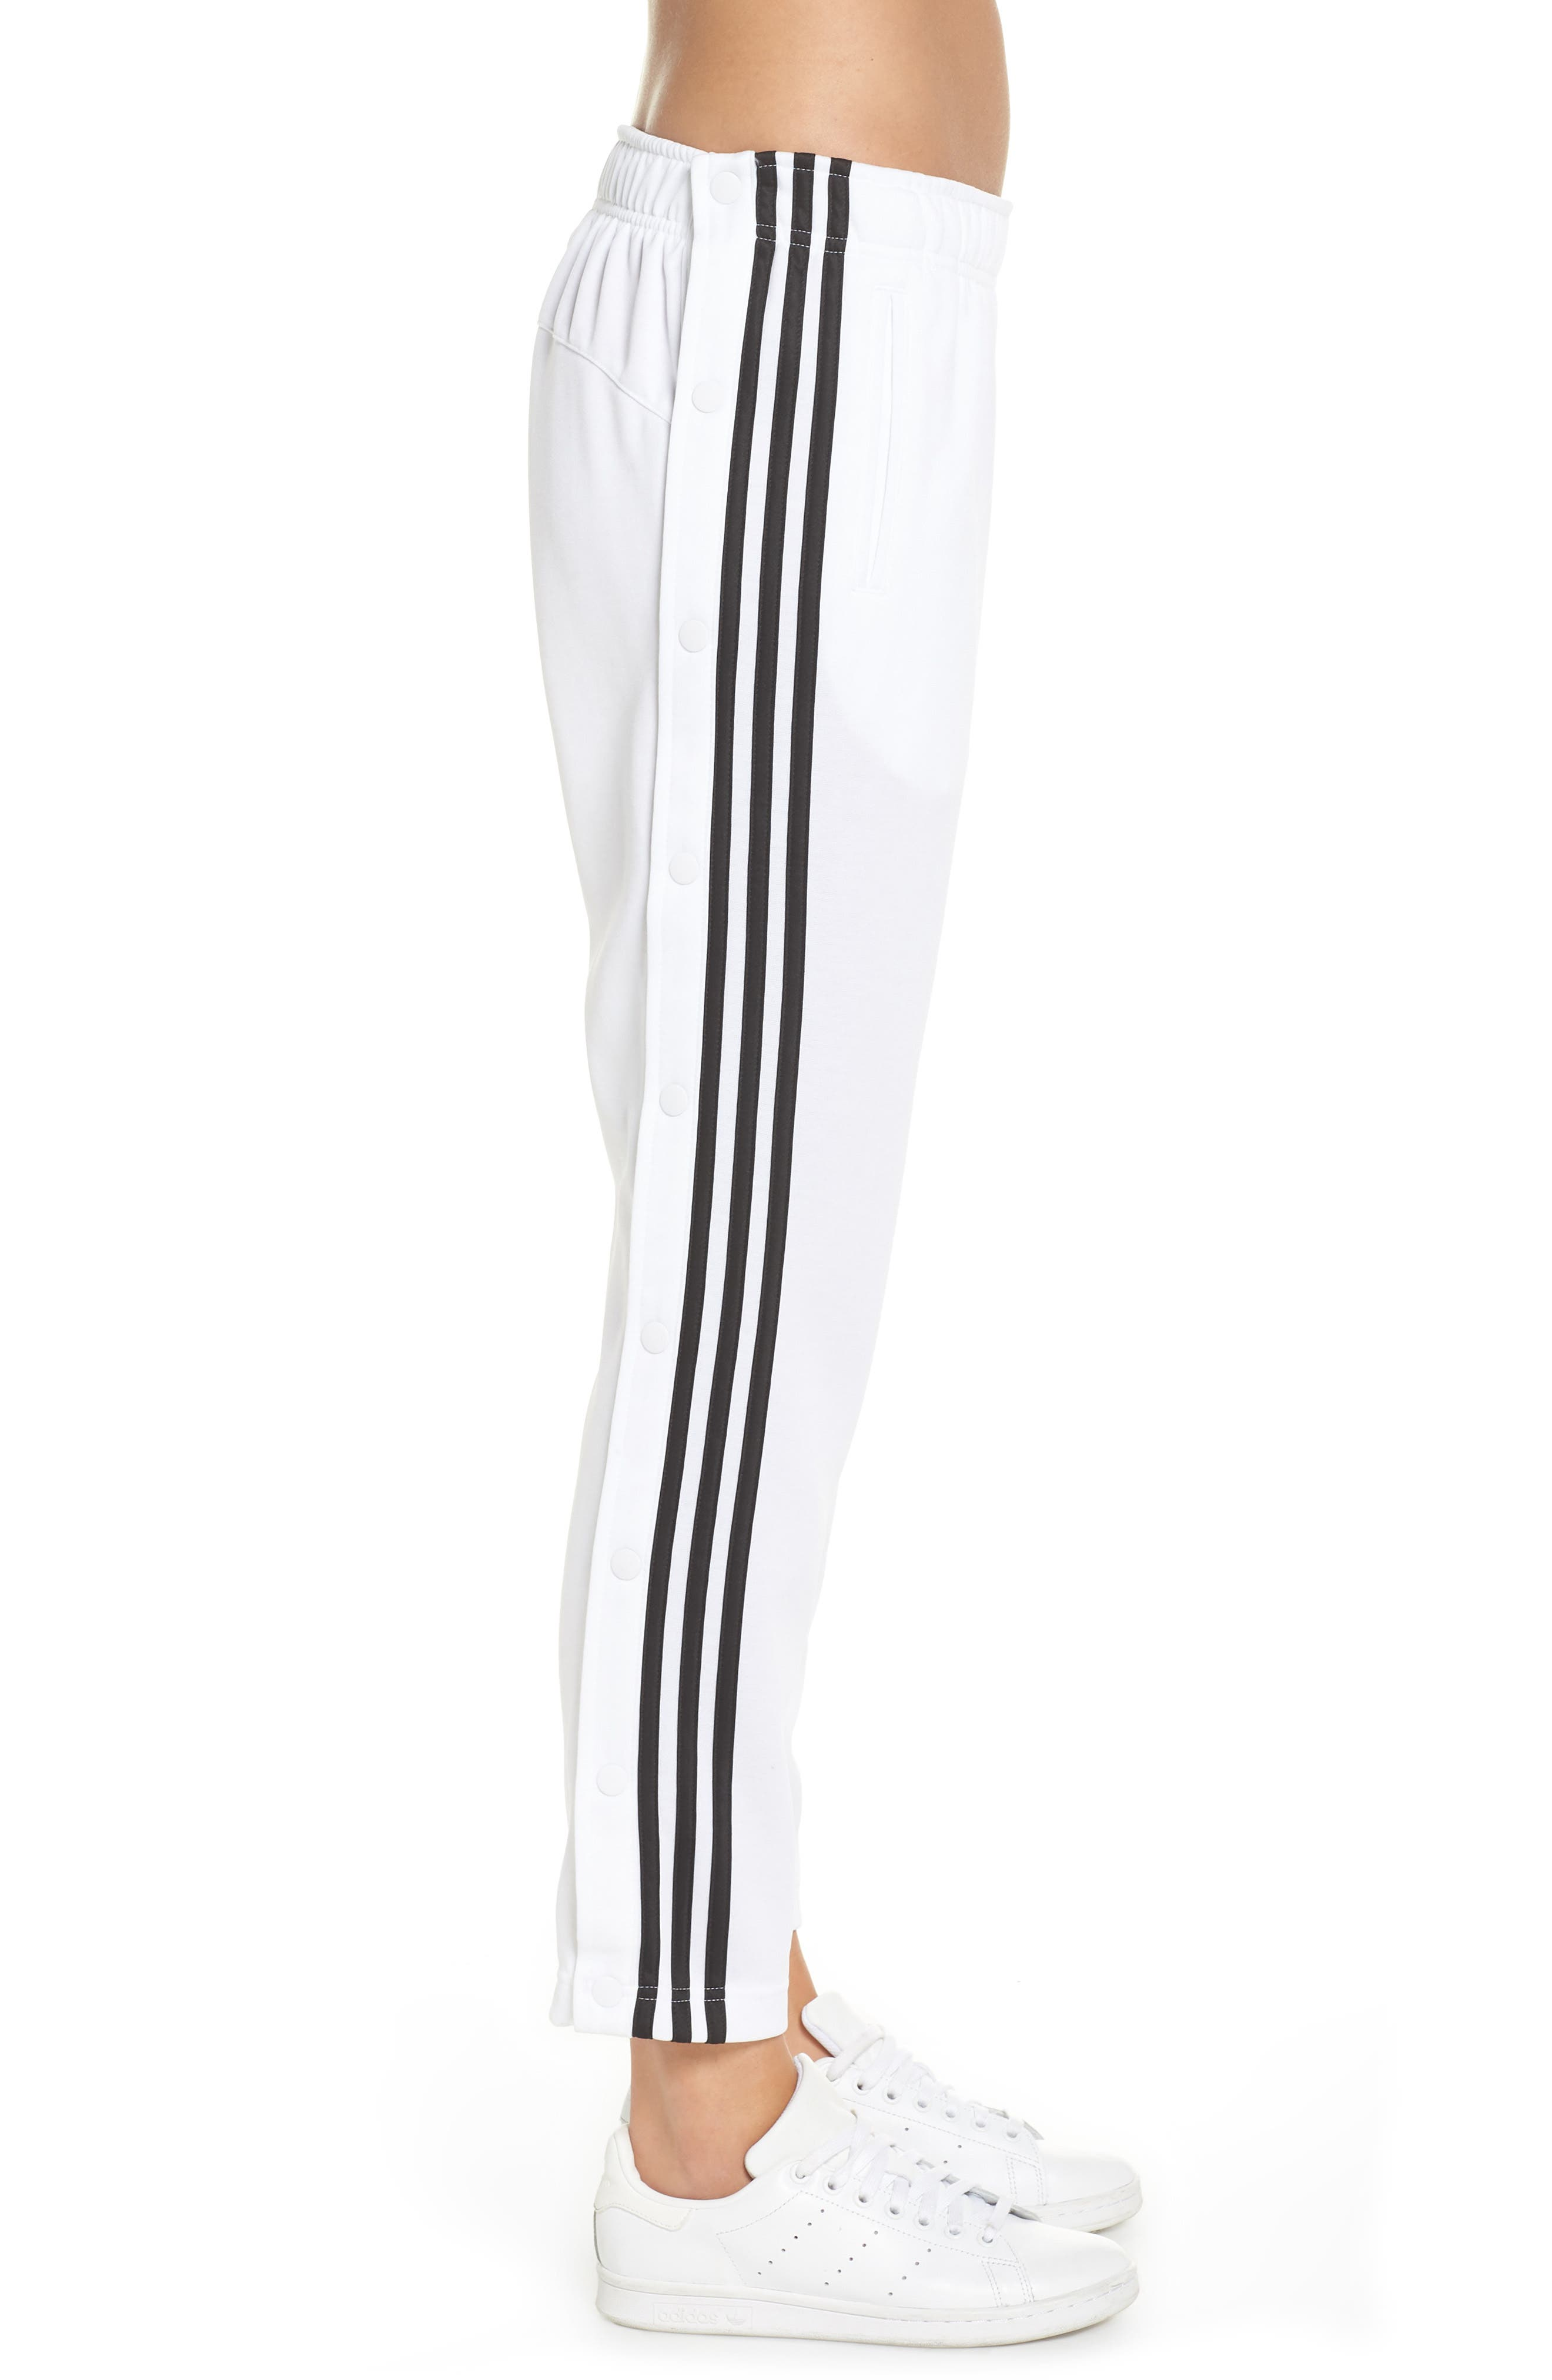 Tricot Snap Pants,                             Alternate thumbnail 3, color,                             WHITE/ BLACK/ BLACK